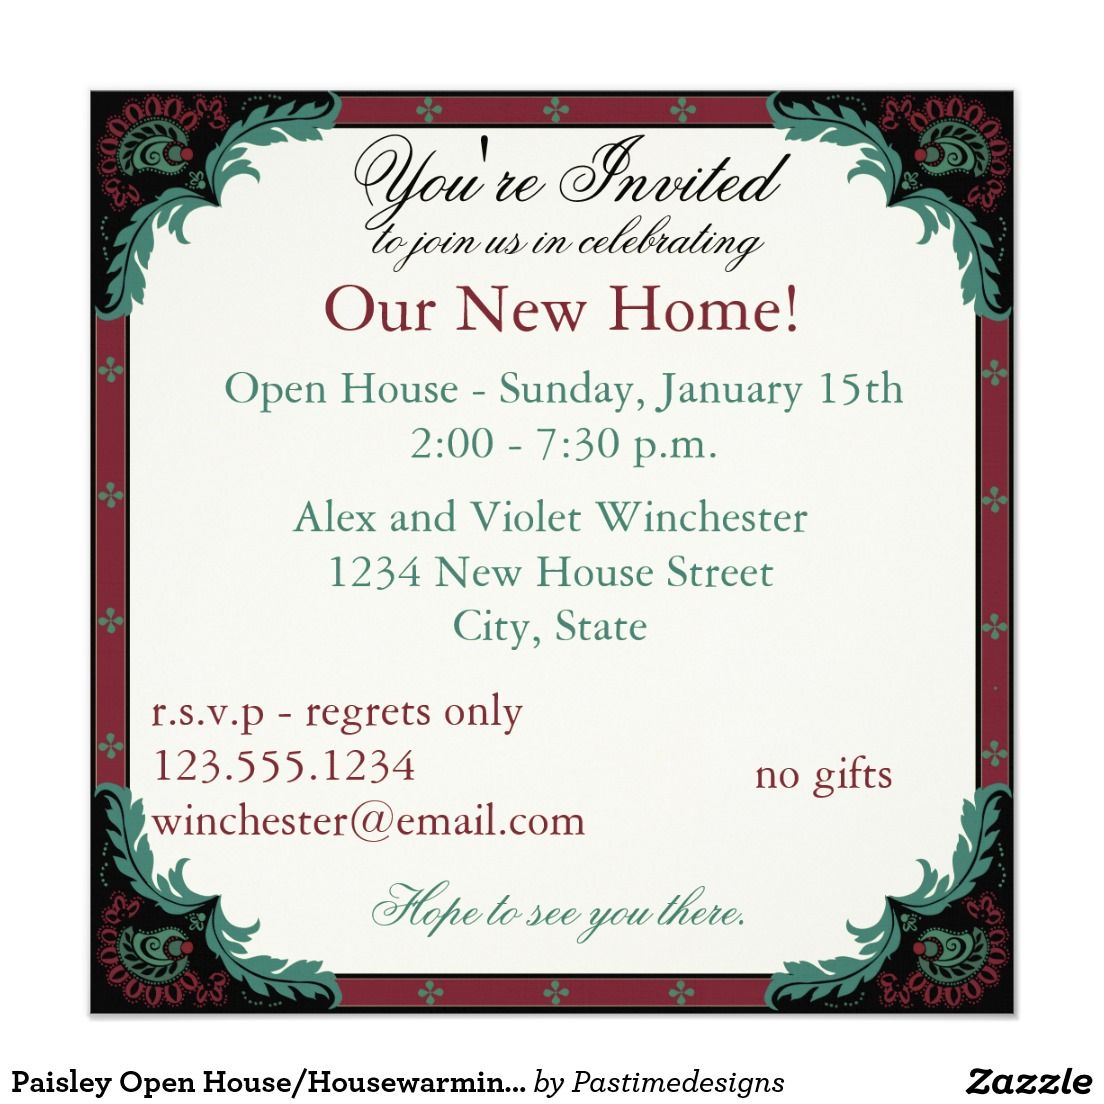 Paisley open househousewarming party card housewarming party paisley open househousewarming party 525x525 square paper invitation card stopboris Choice Image